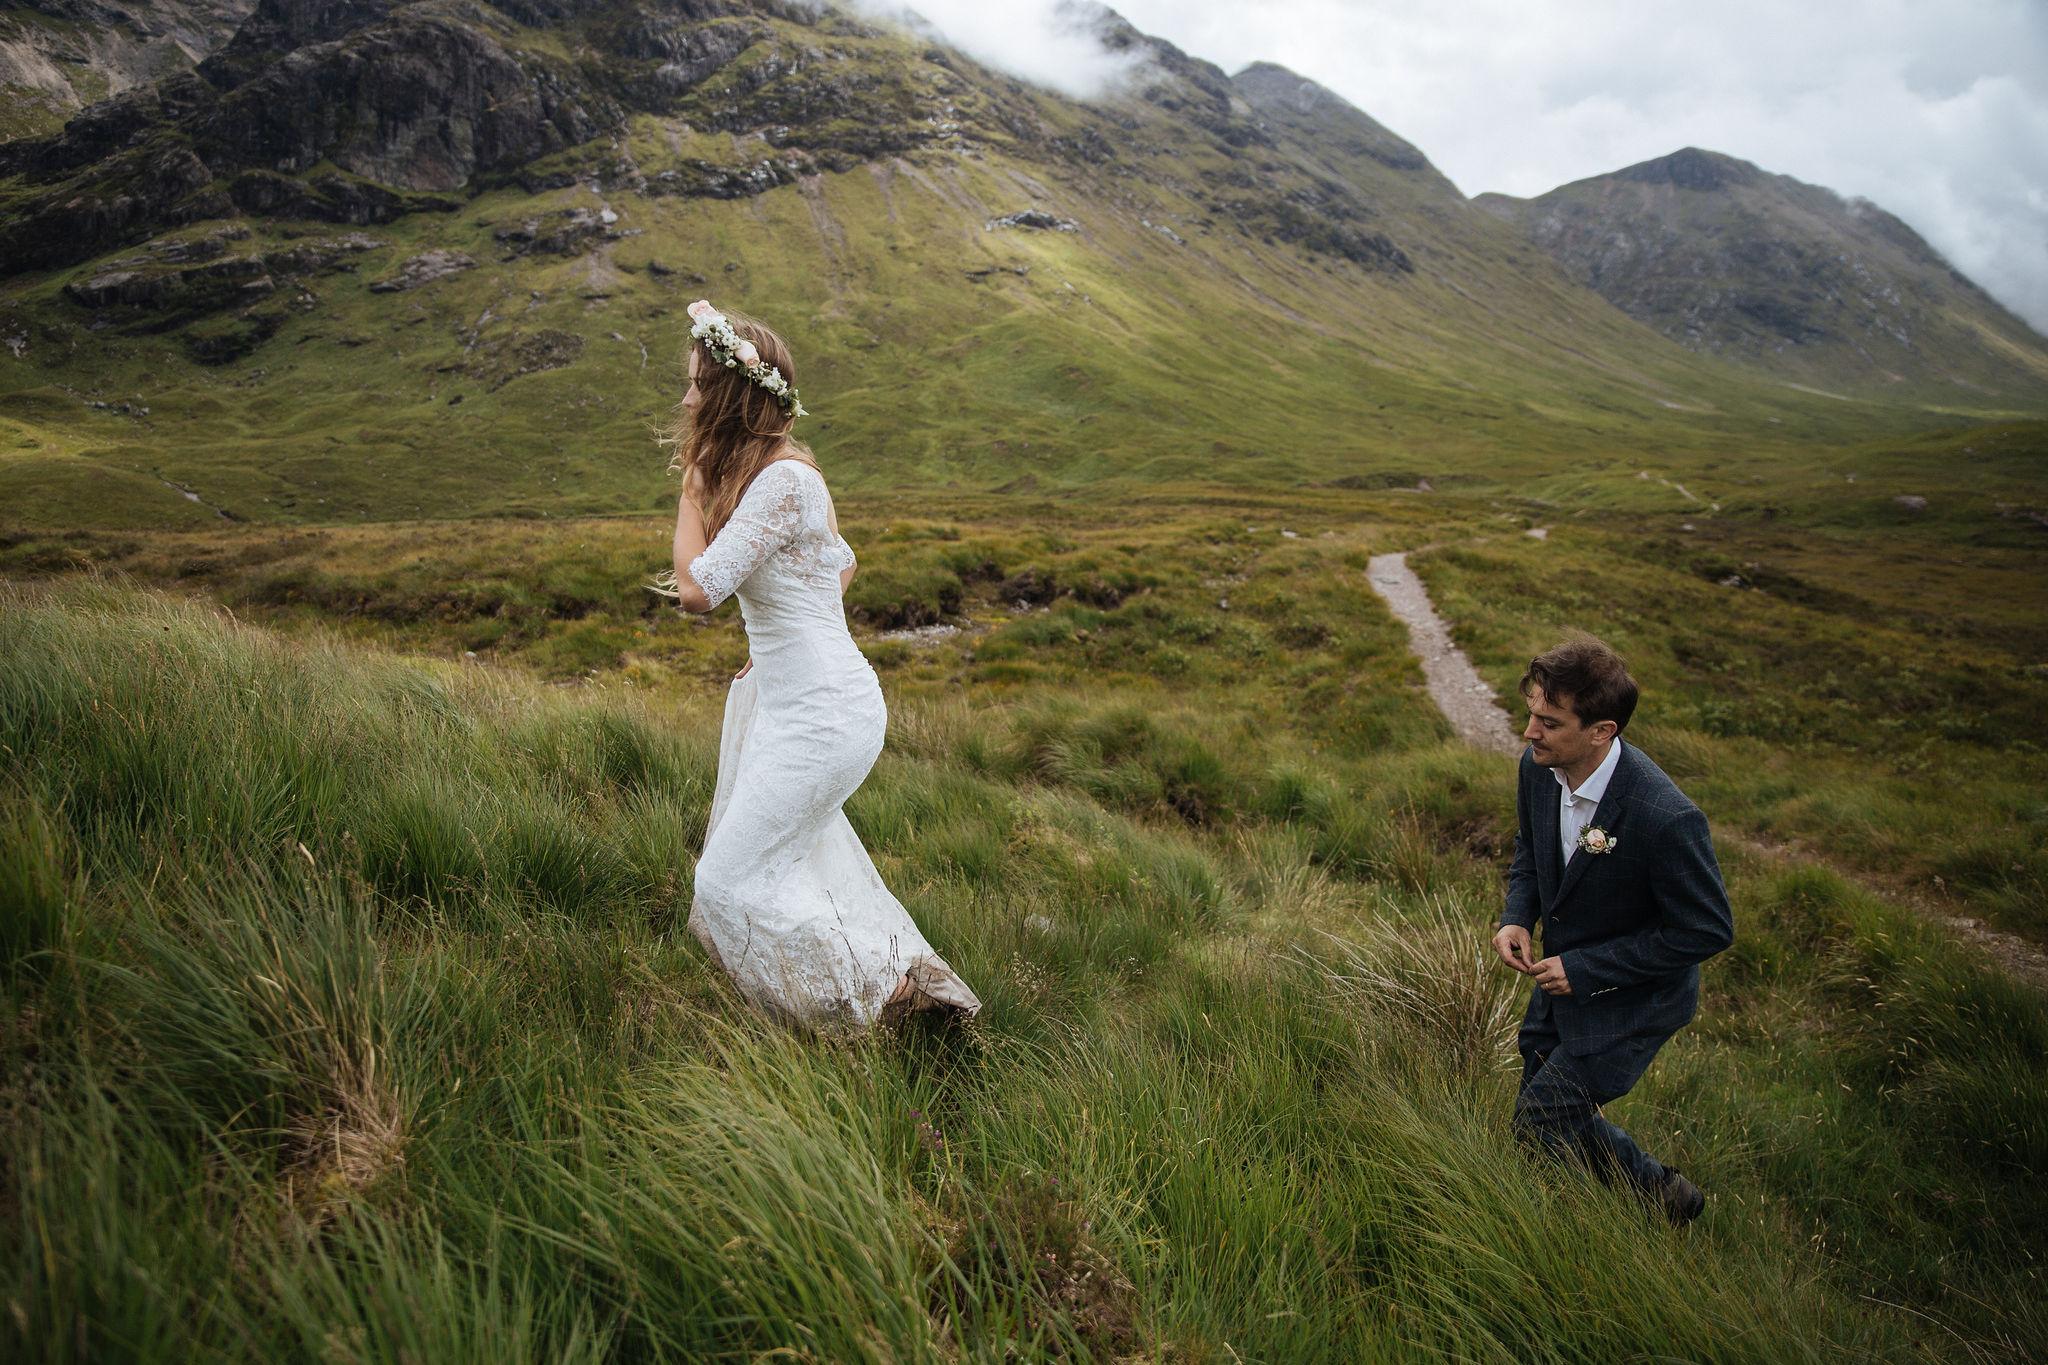 Dirty wedding dress hiking in Scotland